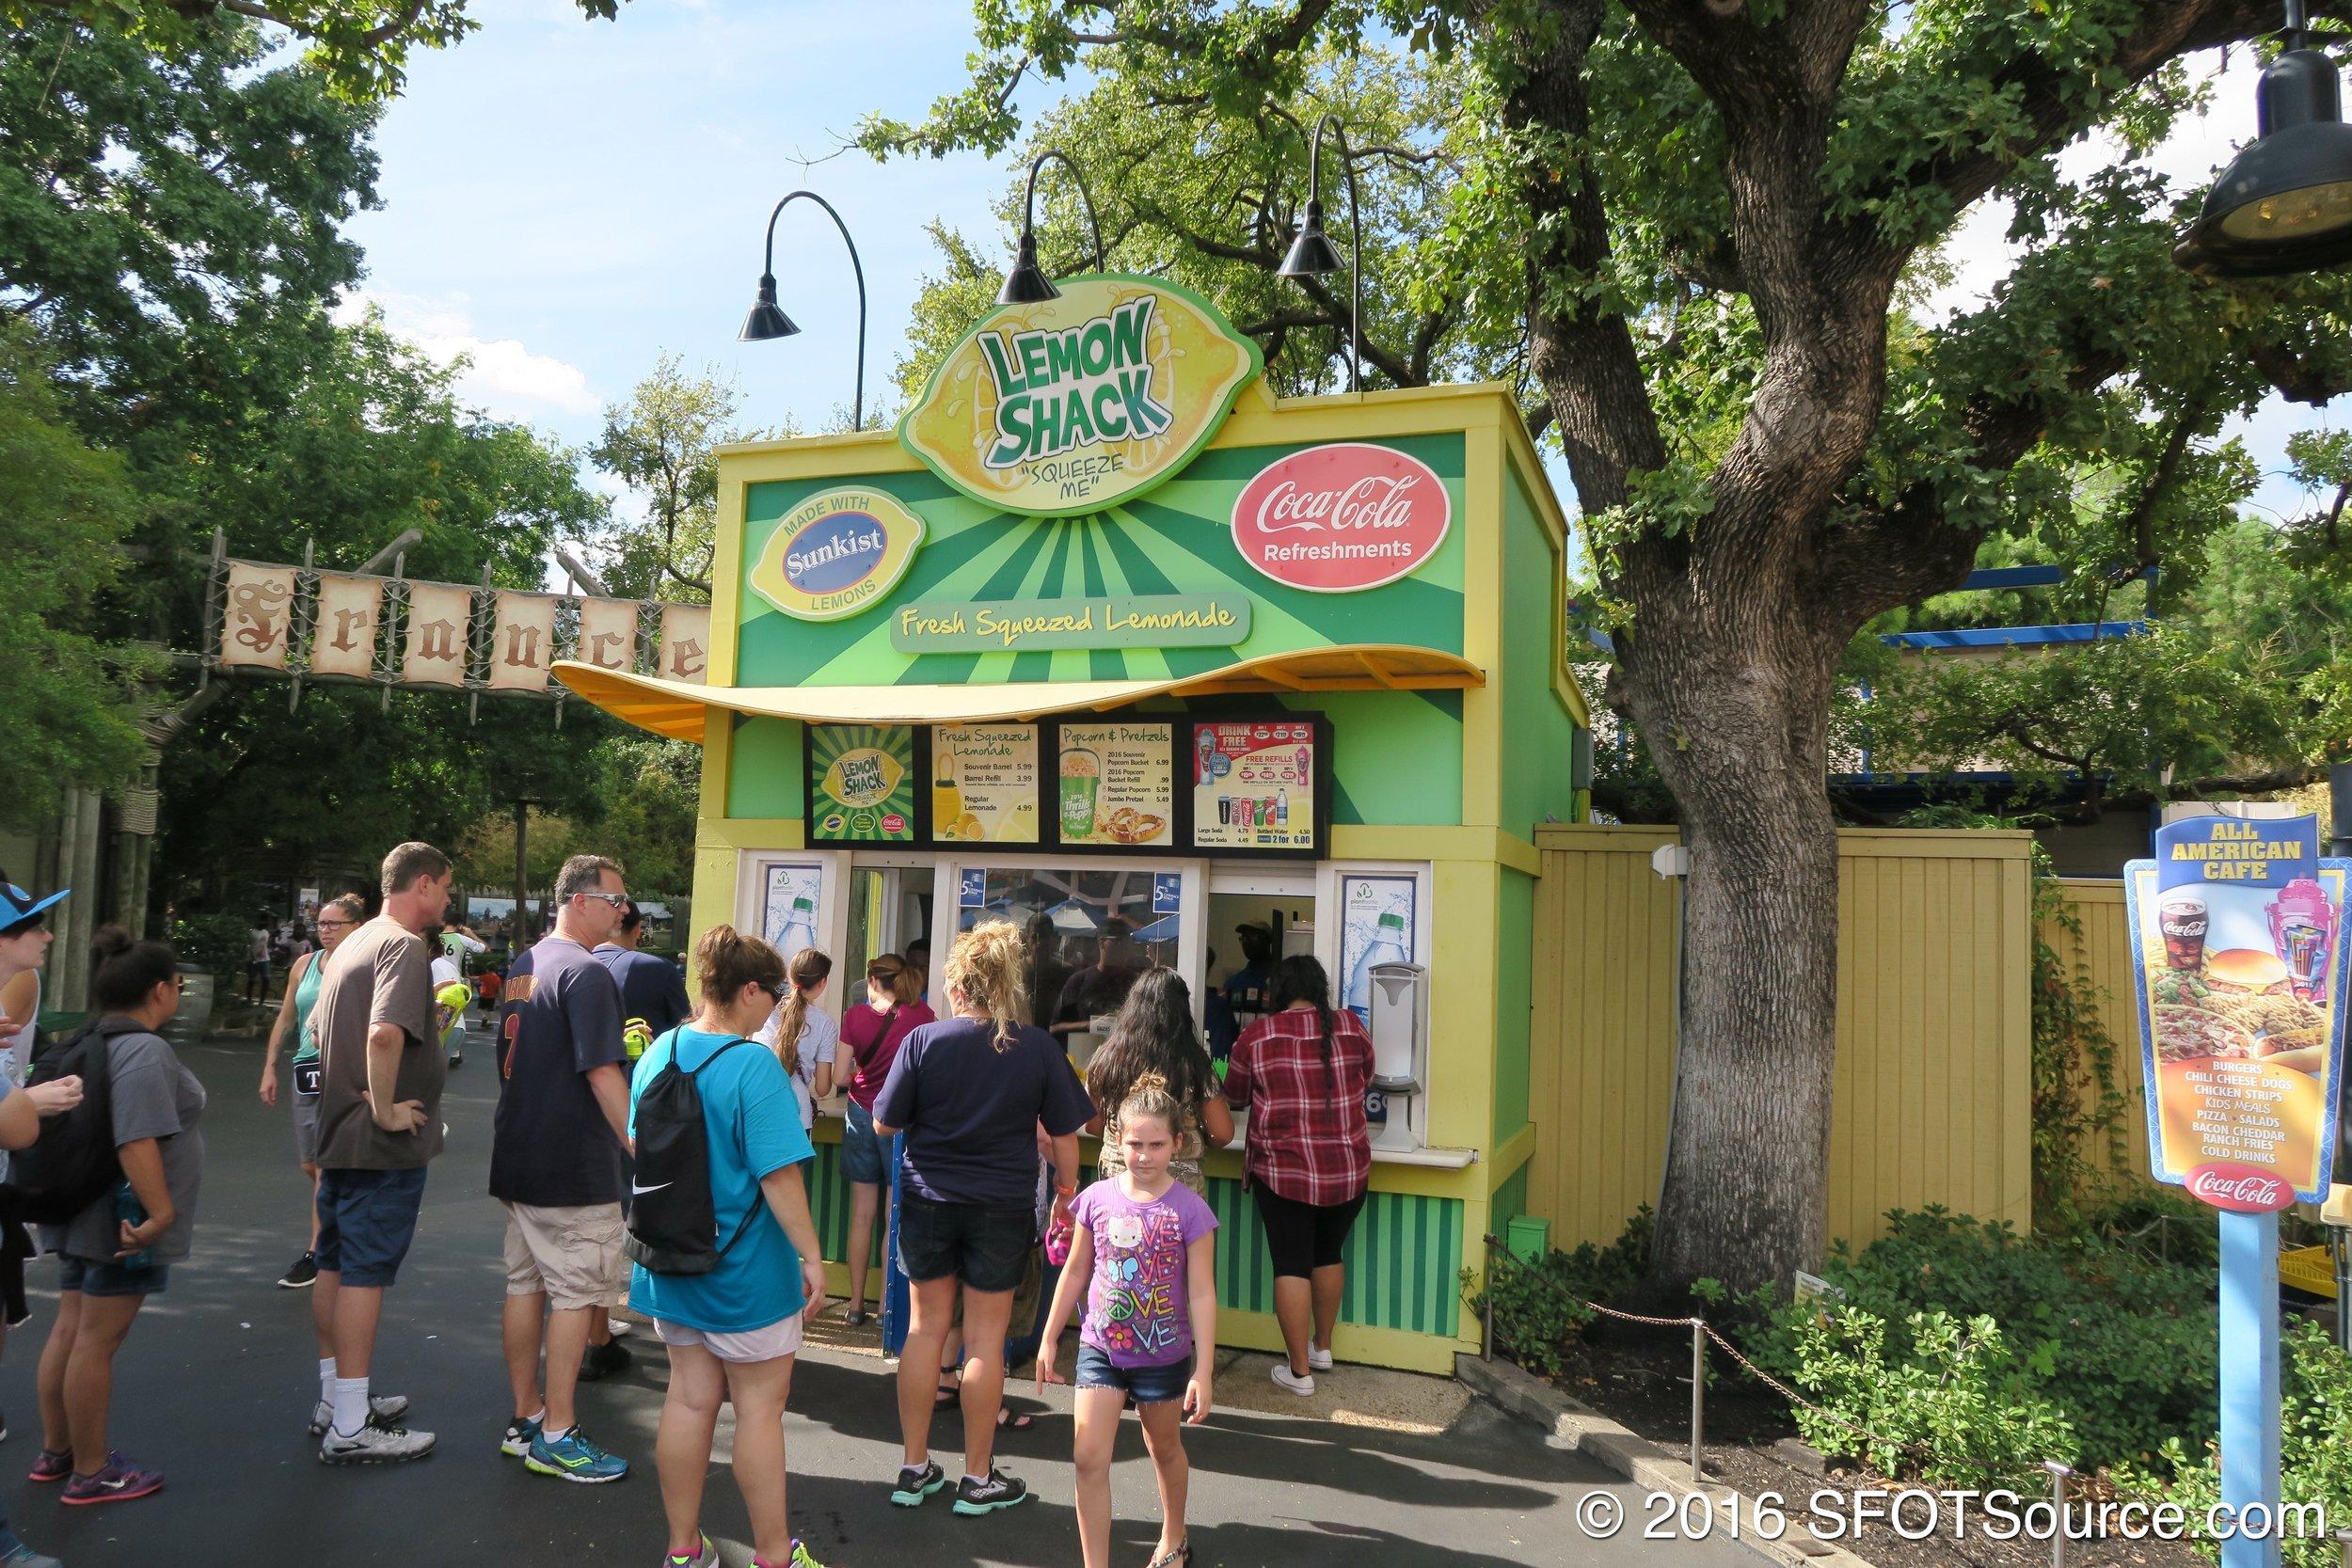 Lemon Shack serves up fresh-squeezed lemonade and more.